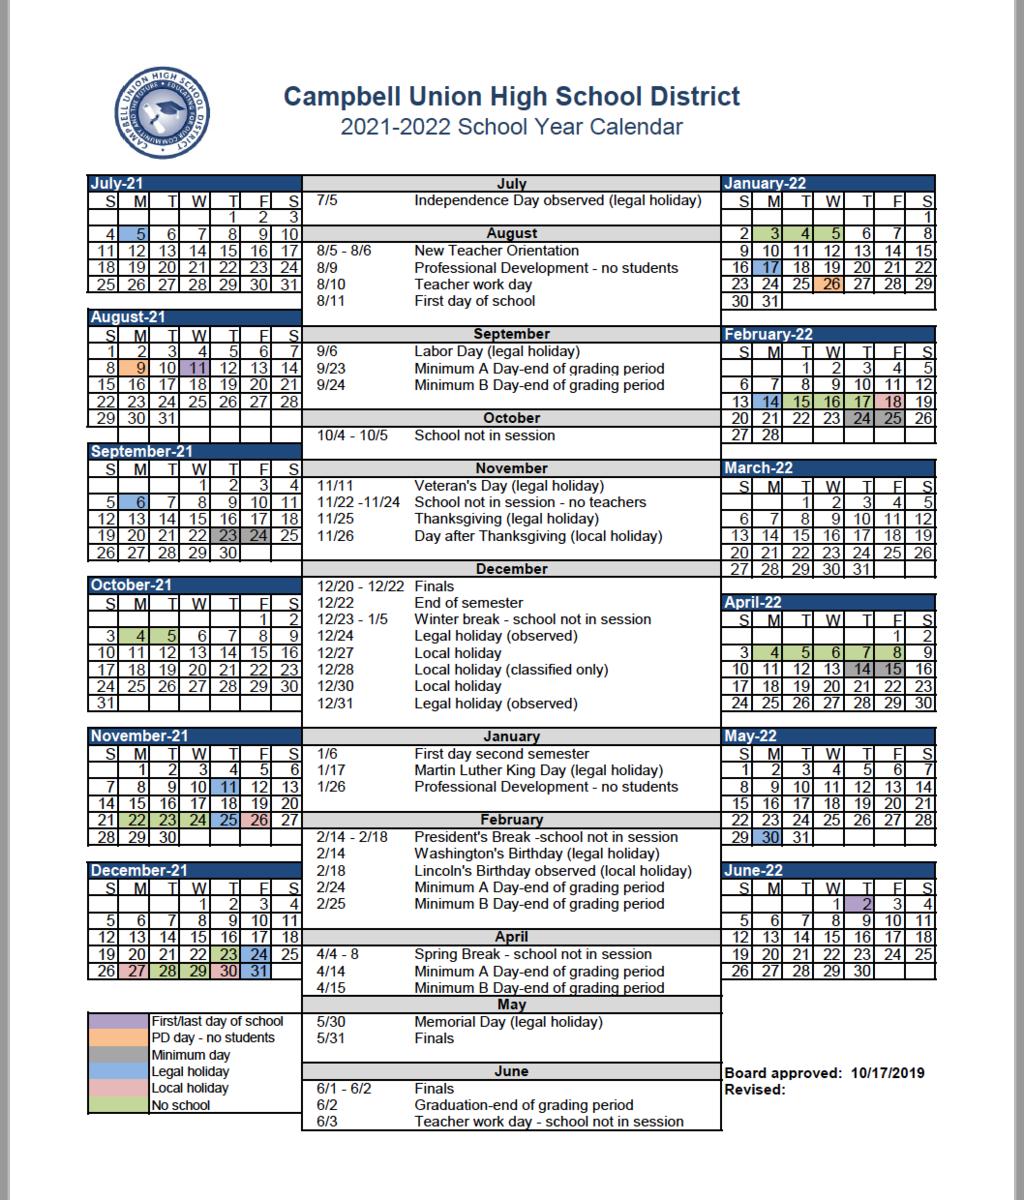 image of 2021-22 CUHSD academic calendar